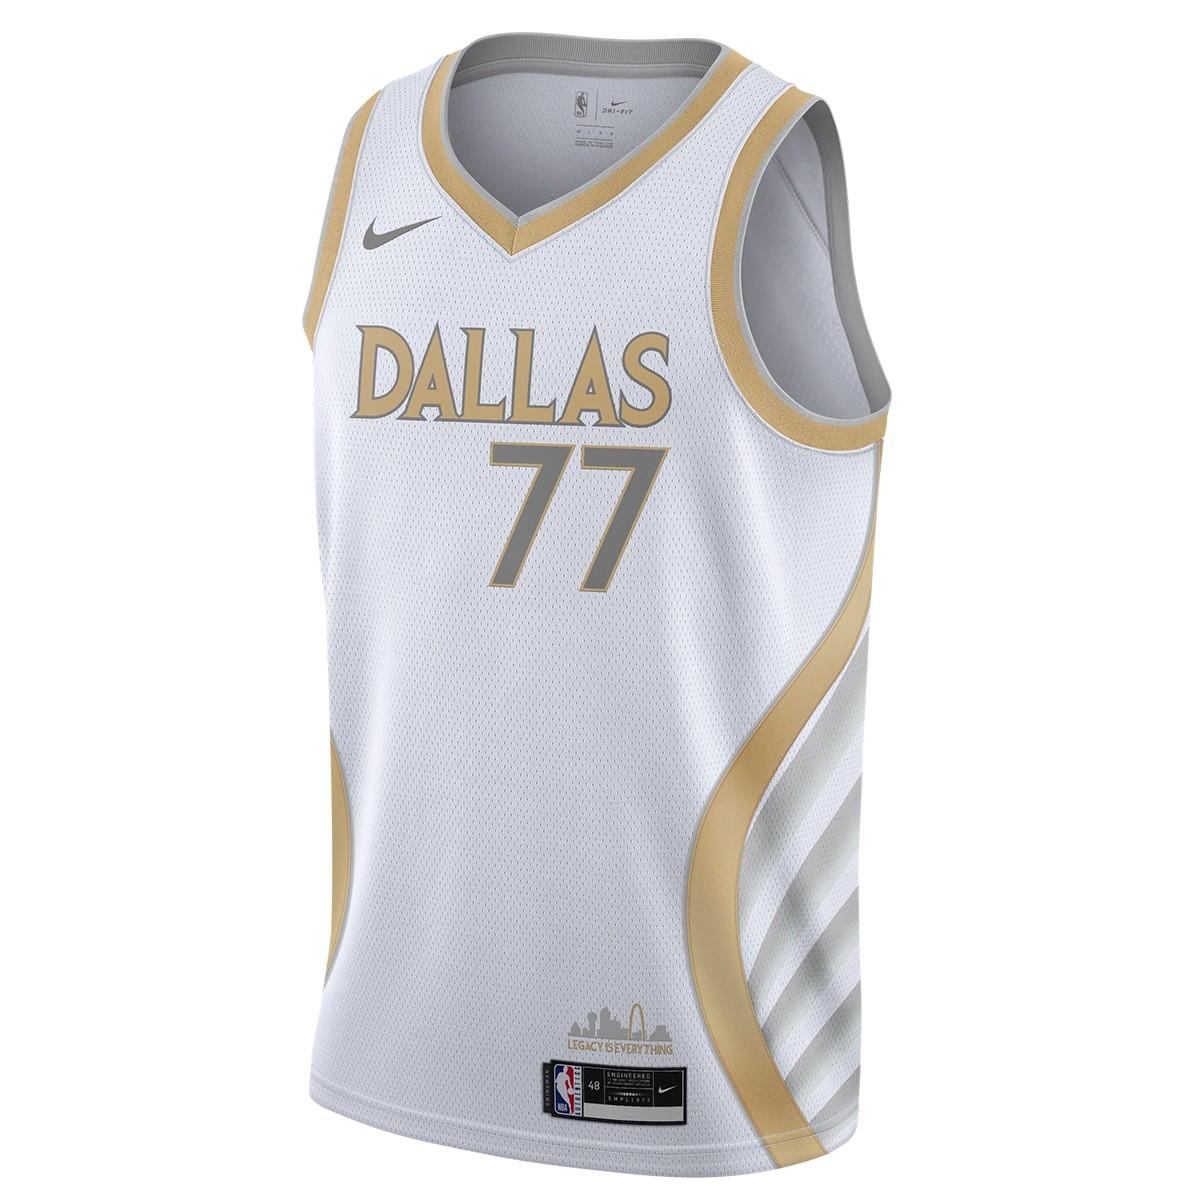 Nike NBA Dallas Mavericks Swingman Jersey Luka Doncic 'City Edition'